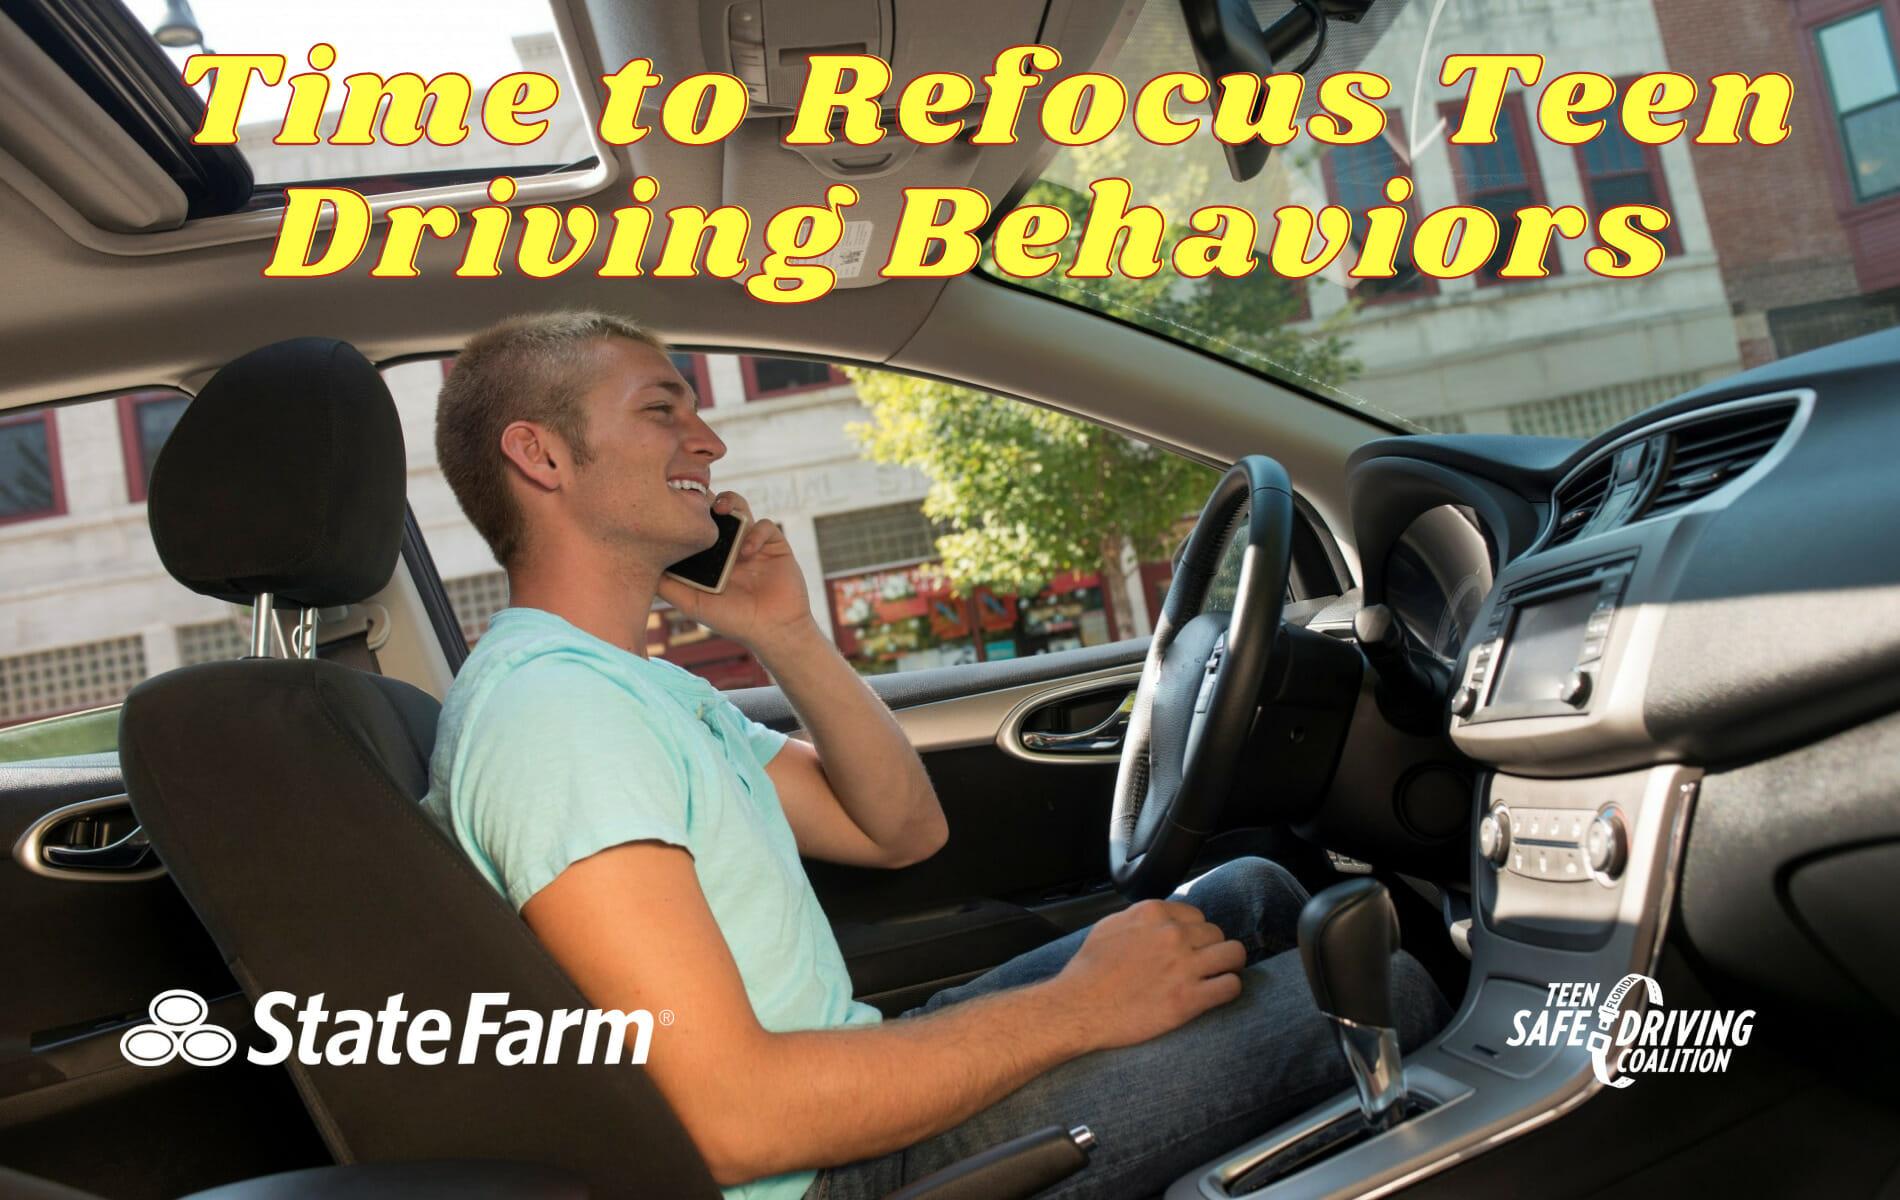 Time to Refocus Teen Driving Behaviors